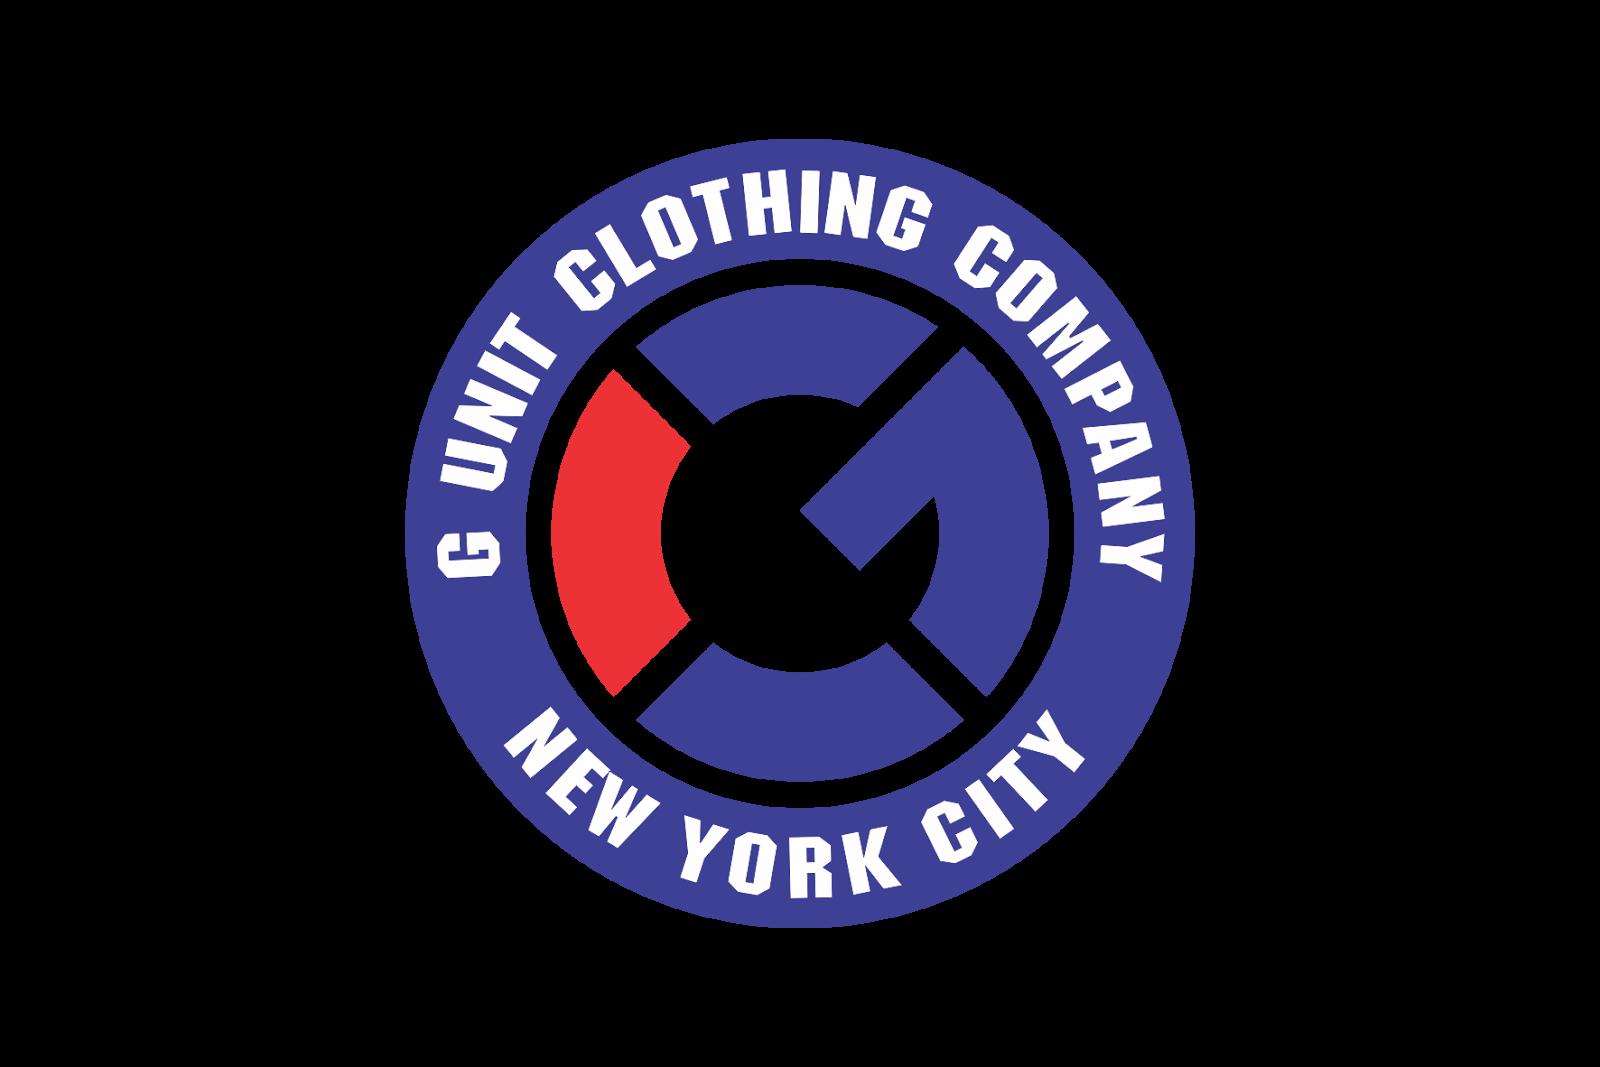 G Unit Clothing Company wwwgalleryhipcom   The Hippest 1600x1067